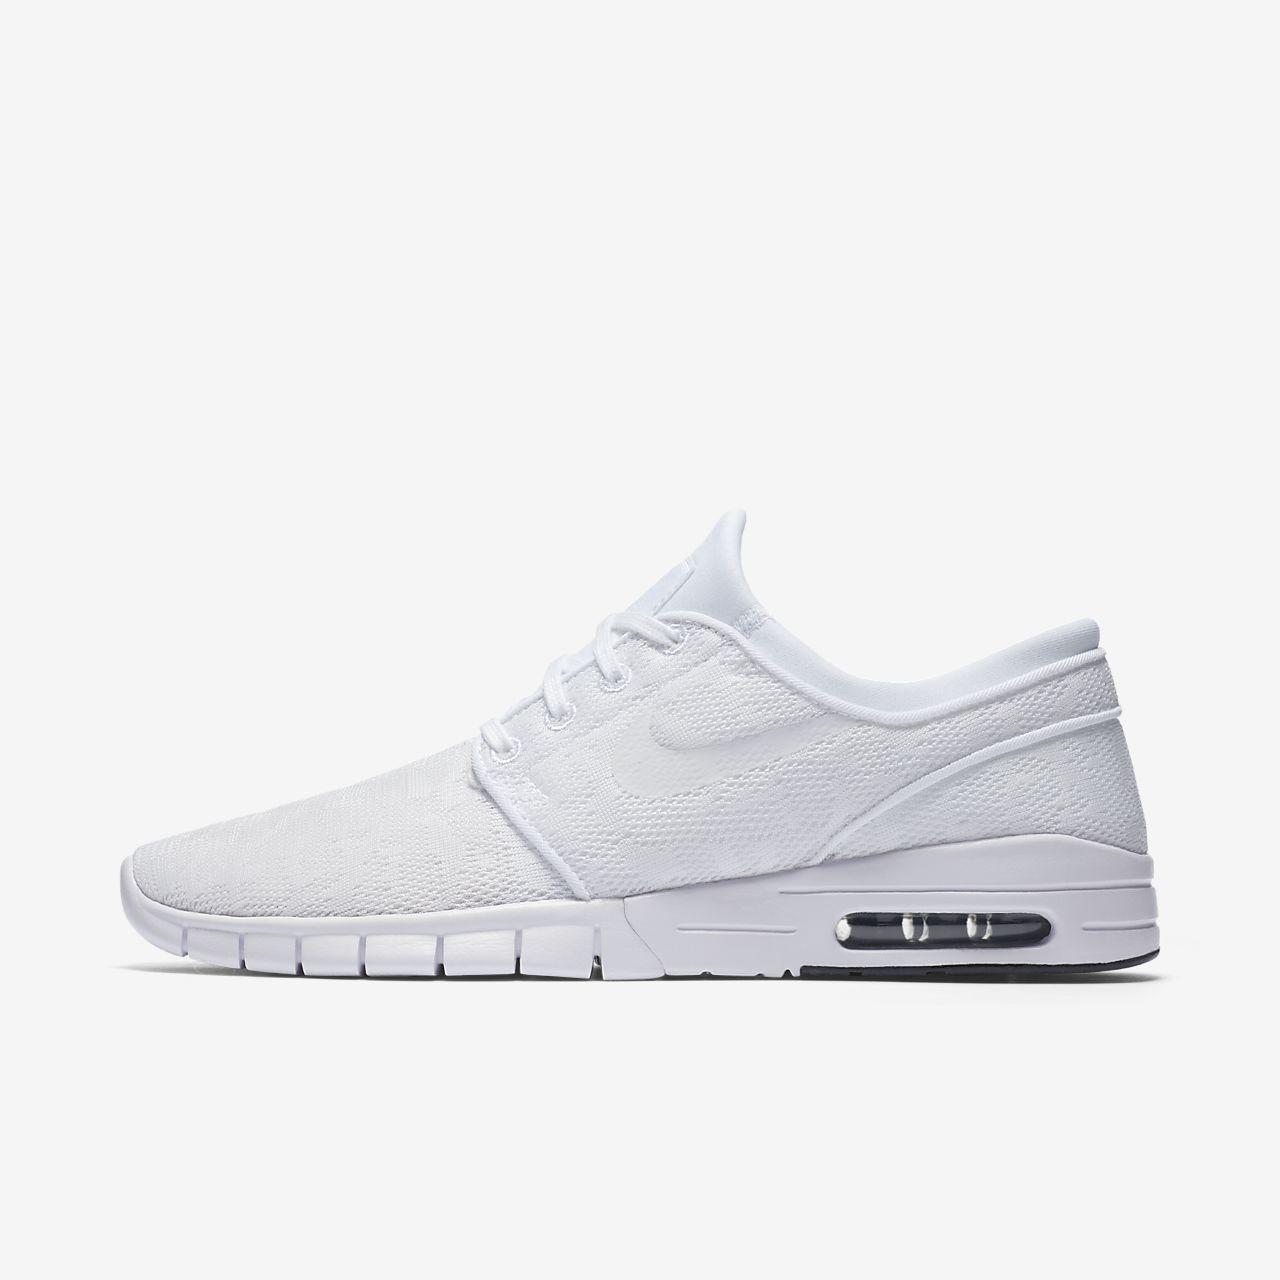 Chaussures Gris Nike Sb Collection 48,5 Pour Les Hommes